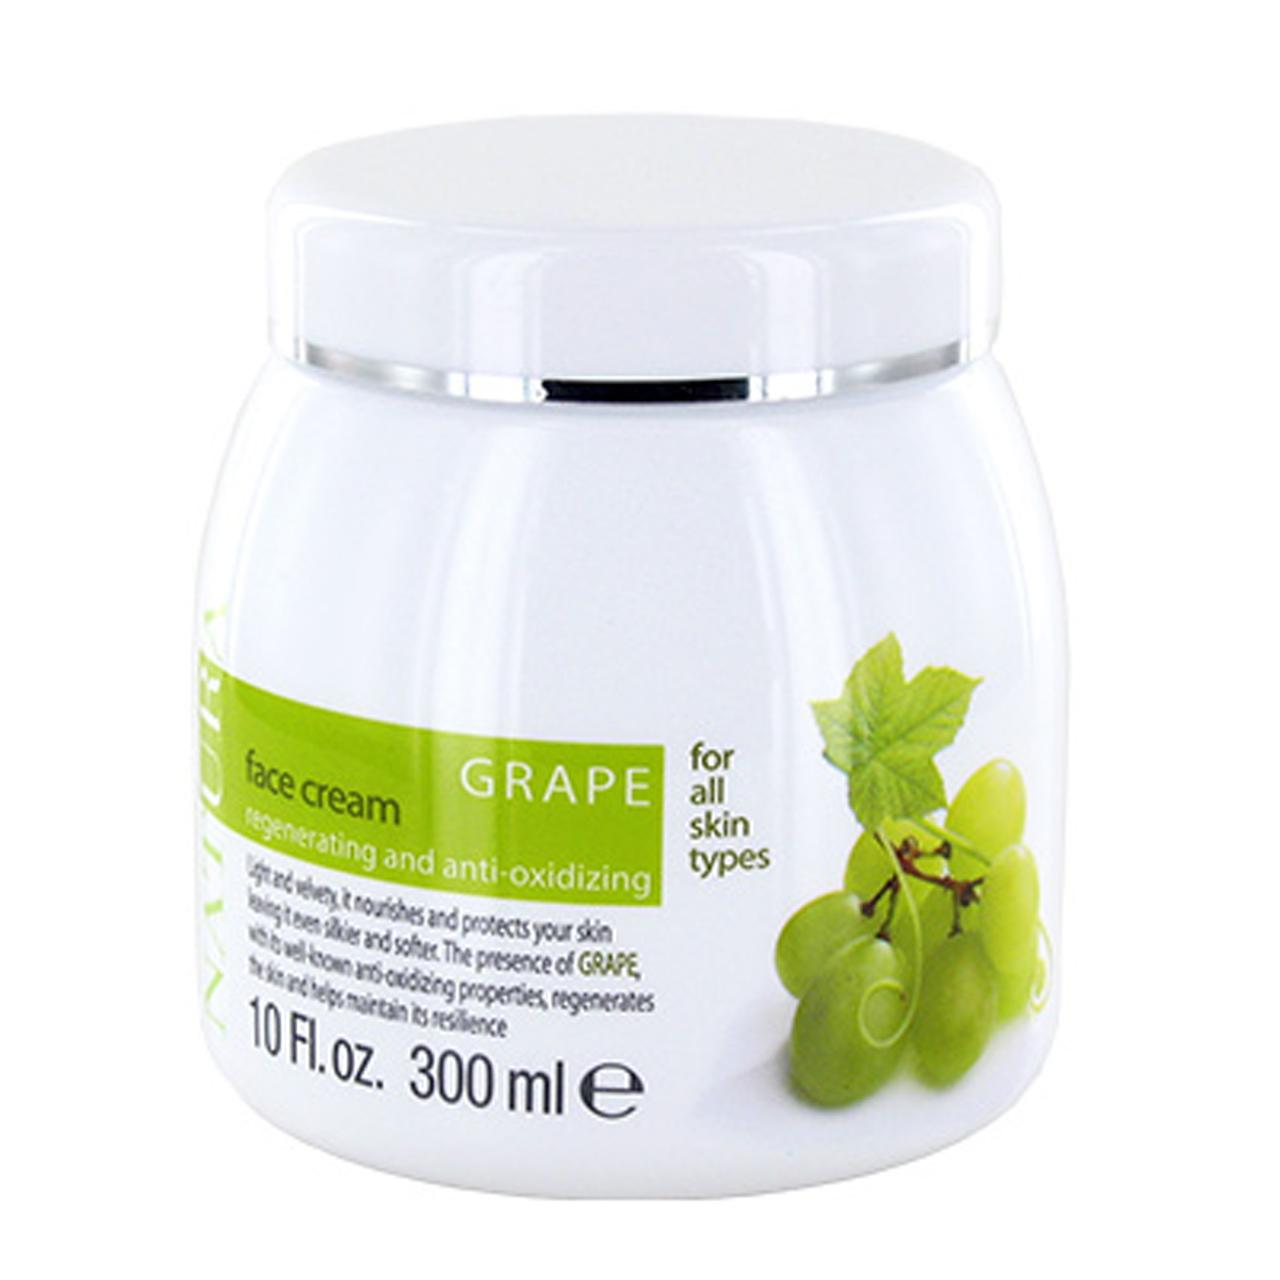 خرید کرم صورت کلیون مدل Grape Face Cream حجم ۳۰۰ میلی لیتر